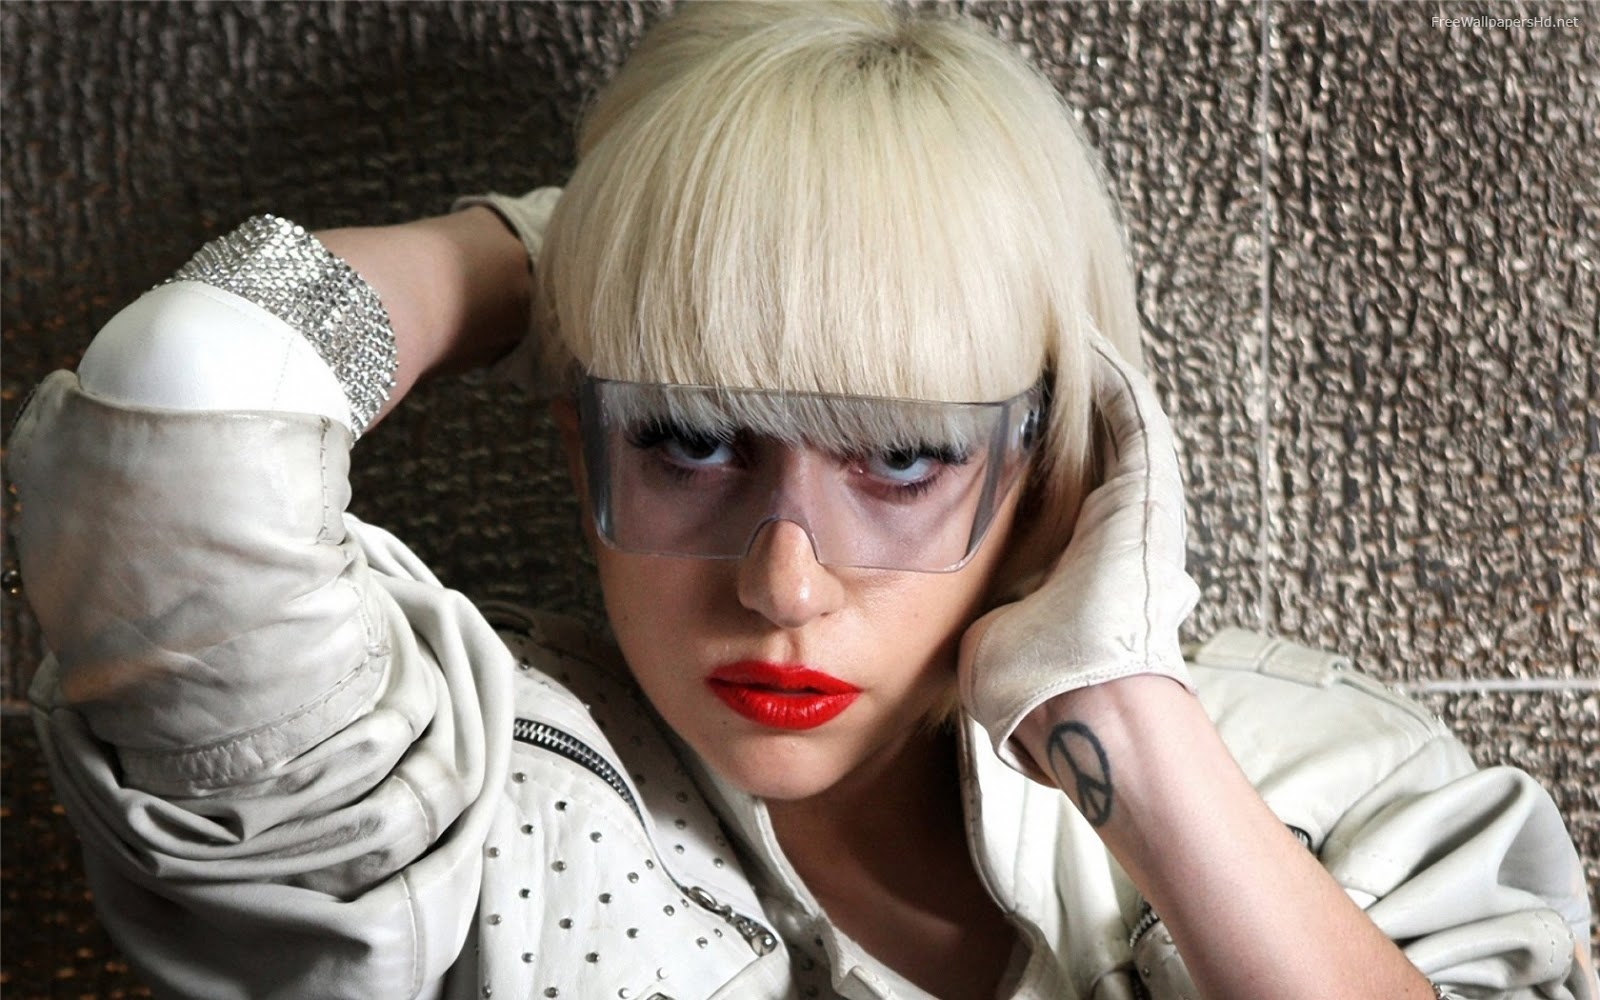 http://4.bp.blogspot.com/-sRdMSA4coX8/UINsnYVcWTI/AAAAAAAAAoM/CTSpyU9xg2A/s1600/lady-gaga-face-makeup-5902.jpg